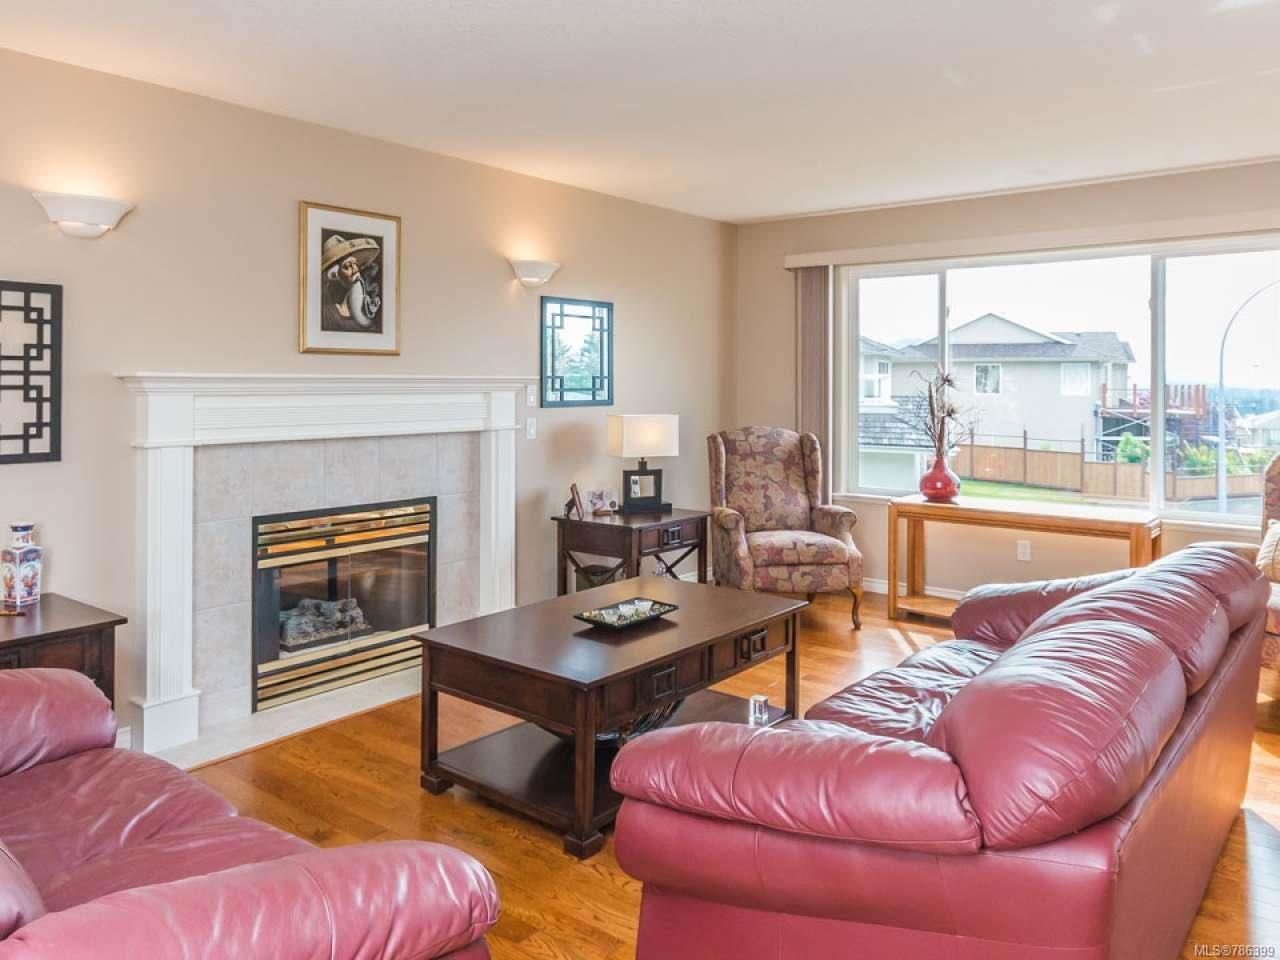 Photo 15: Photos: 5371 HIGHRIDGE PLACE in NANAIMO: Na North Nanaimo House for sale (Nanaimo)  : MLS®# 786399